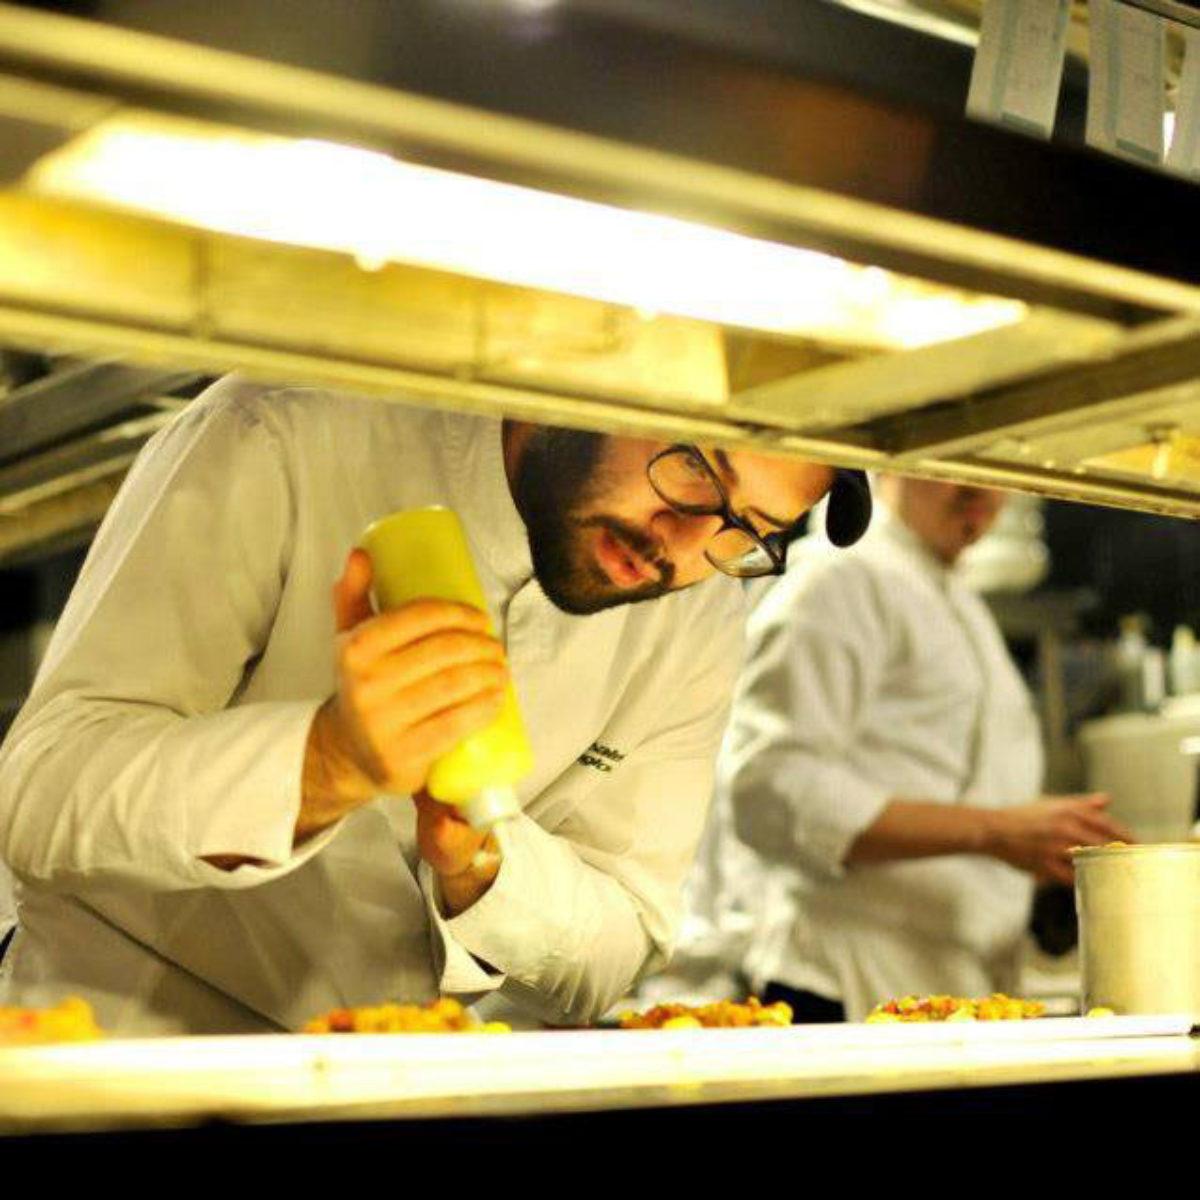 Yiamas Gastro Bar - Καλαμάτα - Μοντέρνα Ευρωπαϊκή Κουζίνα - Gatronomy 15